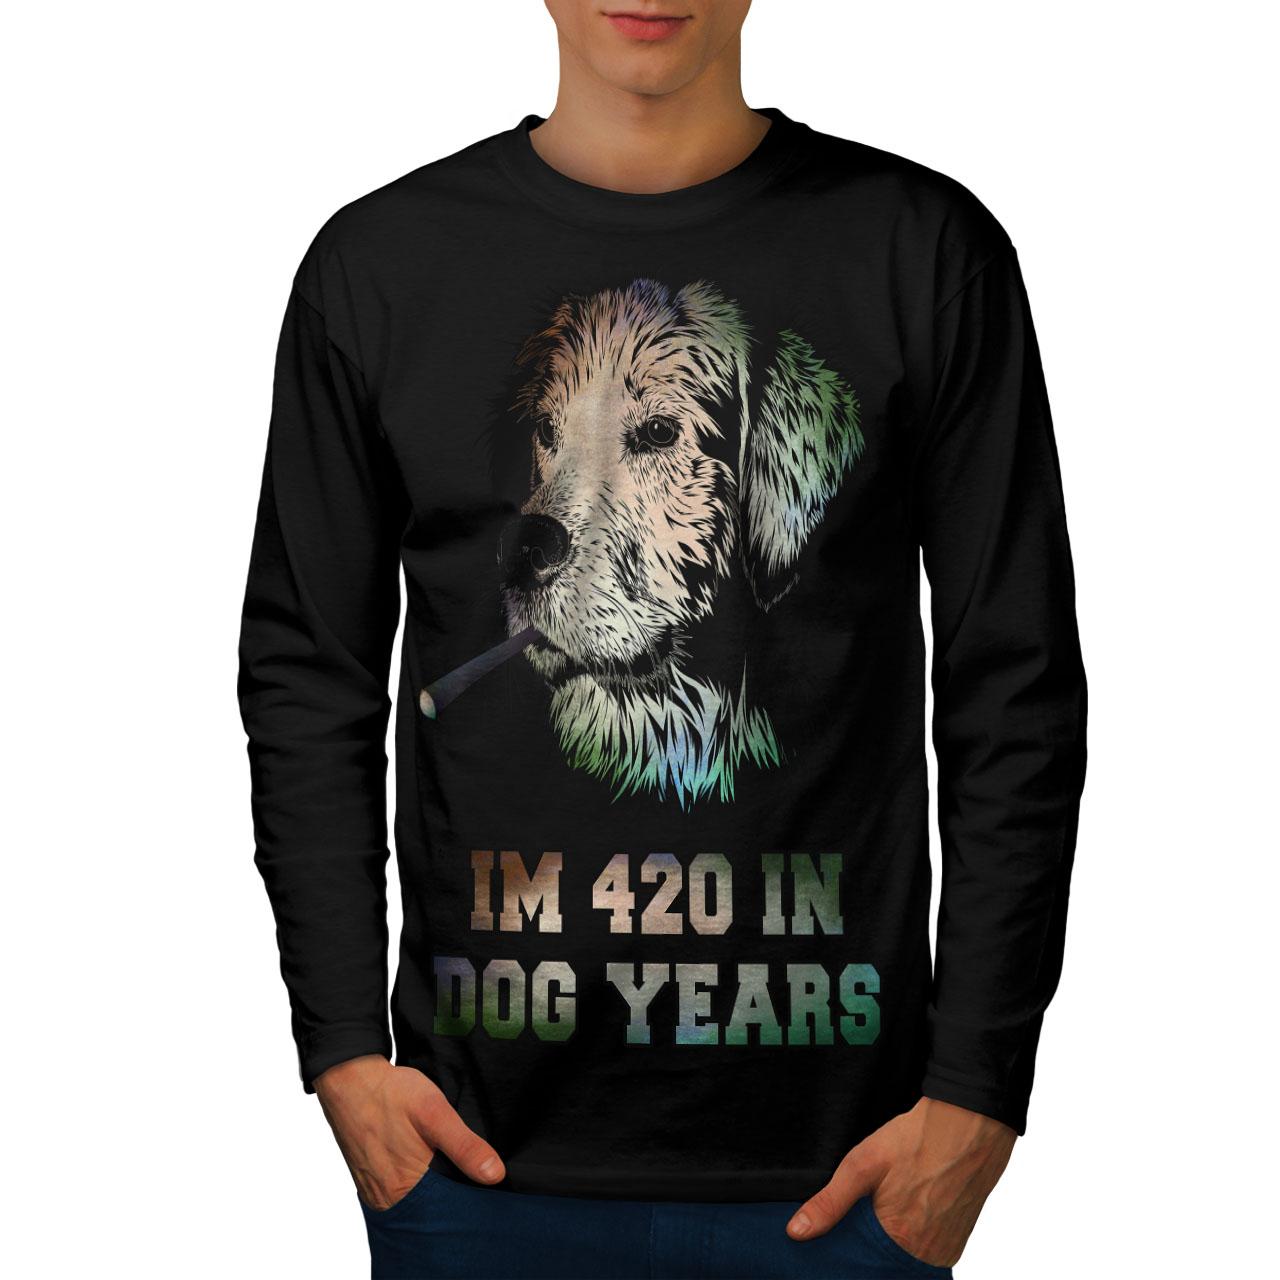 Happy Graphic Design Wellcoda 42 Dog Years Weed Mens Long Sleeve T-shirt